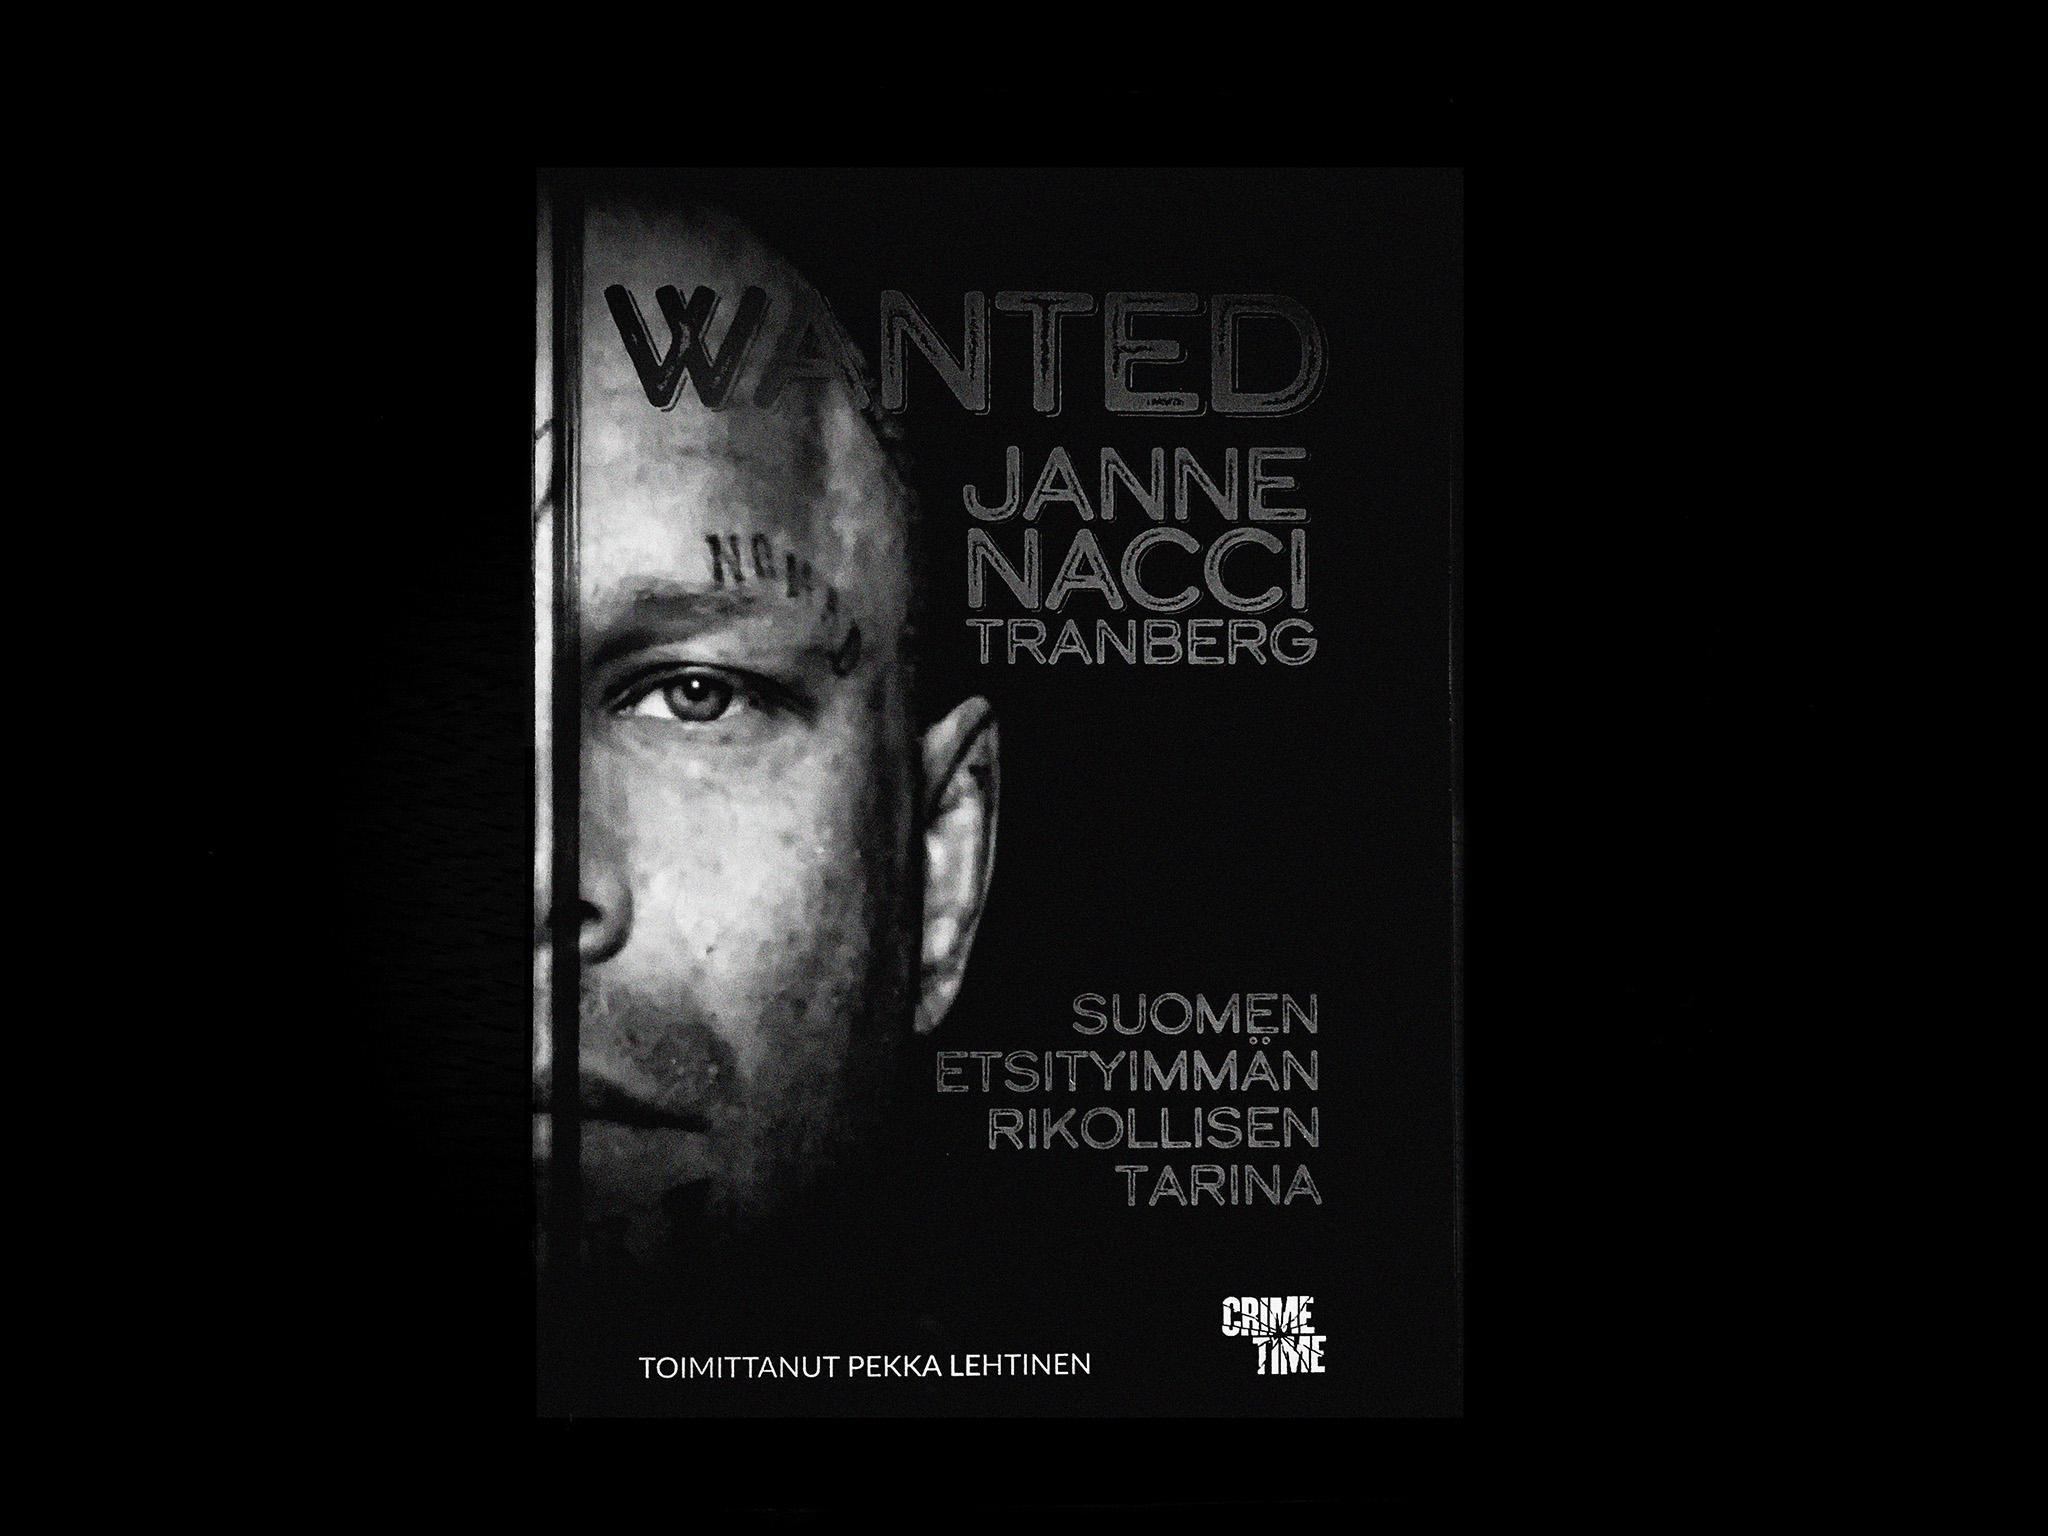 Janne Nacci Wanted